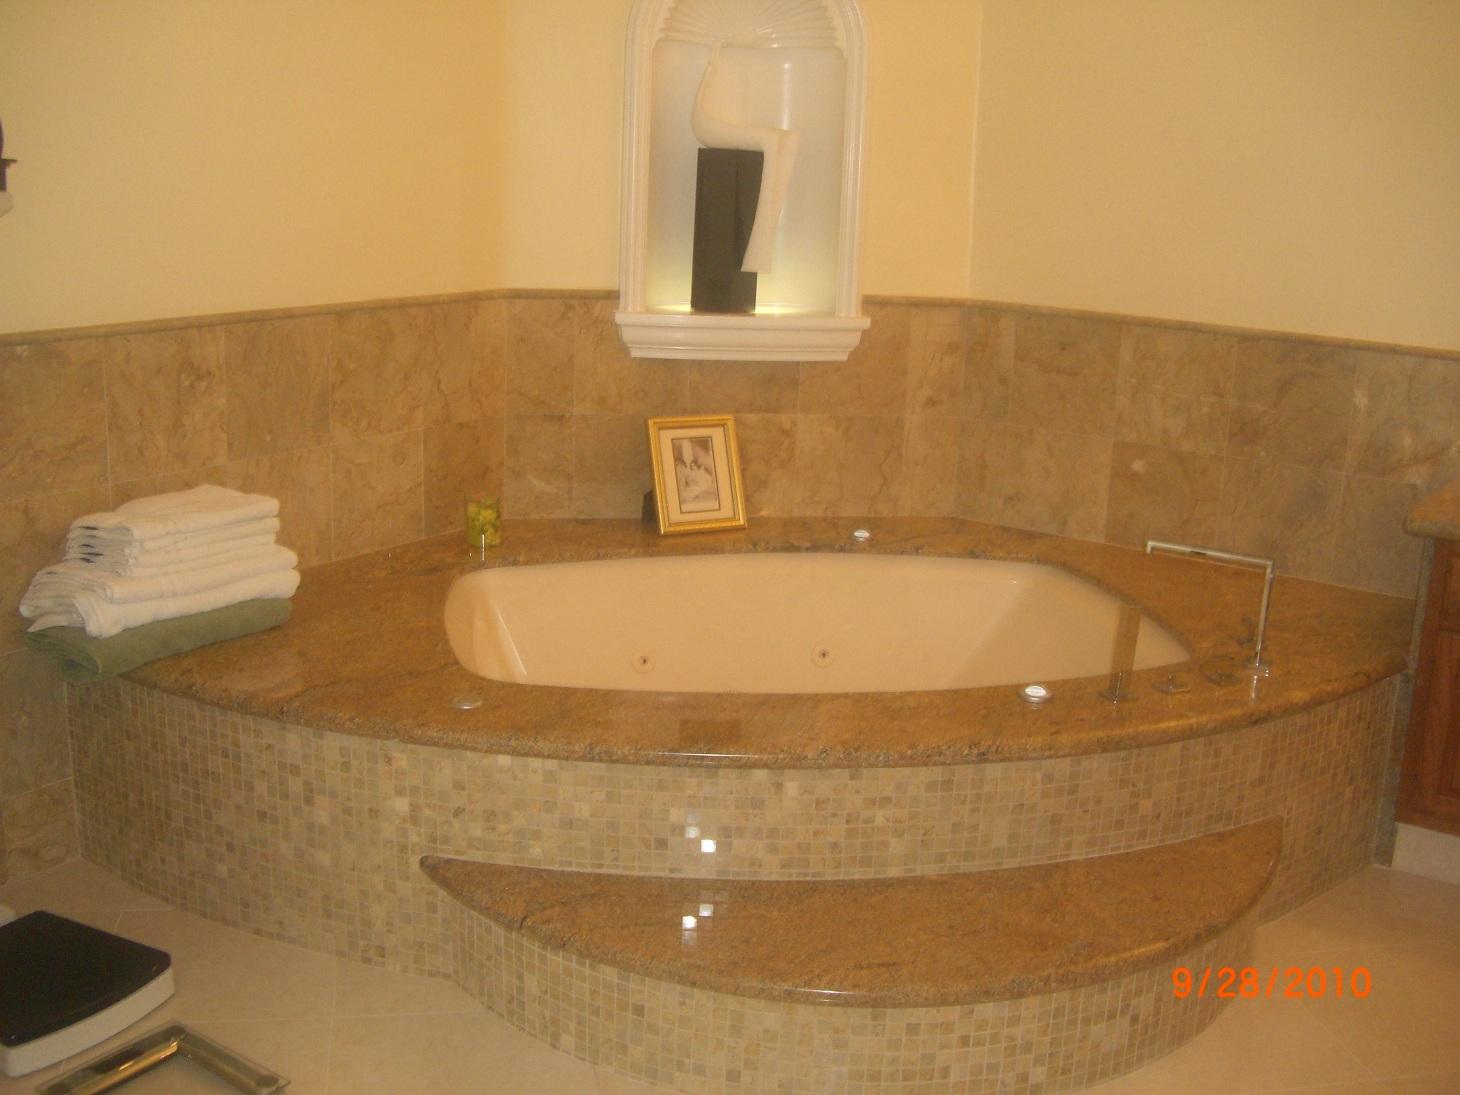 Azure Builders Bathroom Remodeling Contractor West Palm Beach 33409